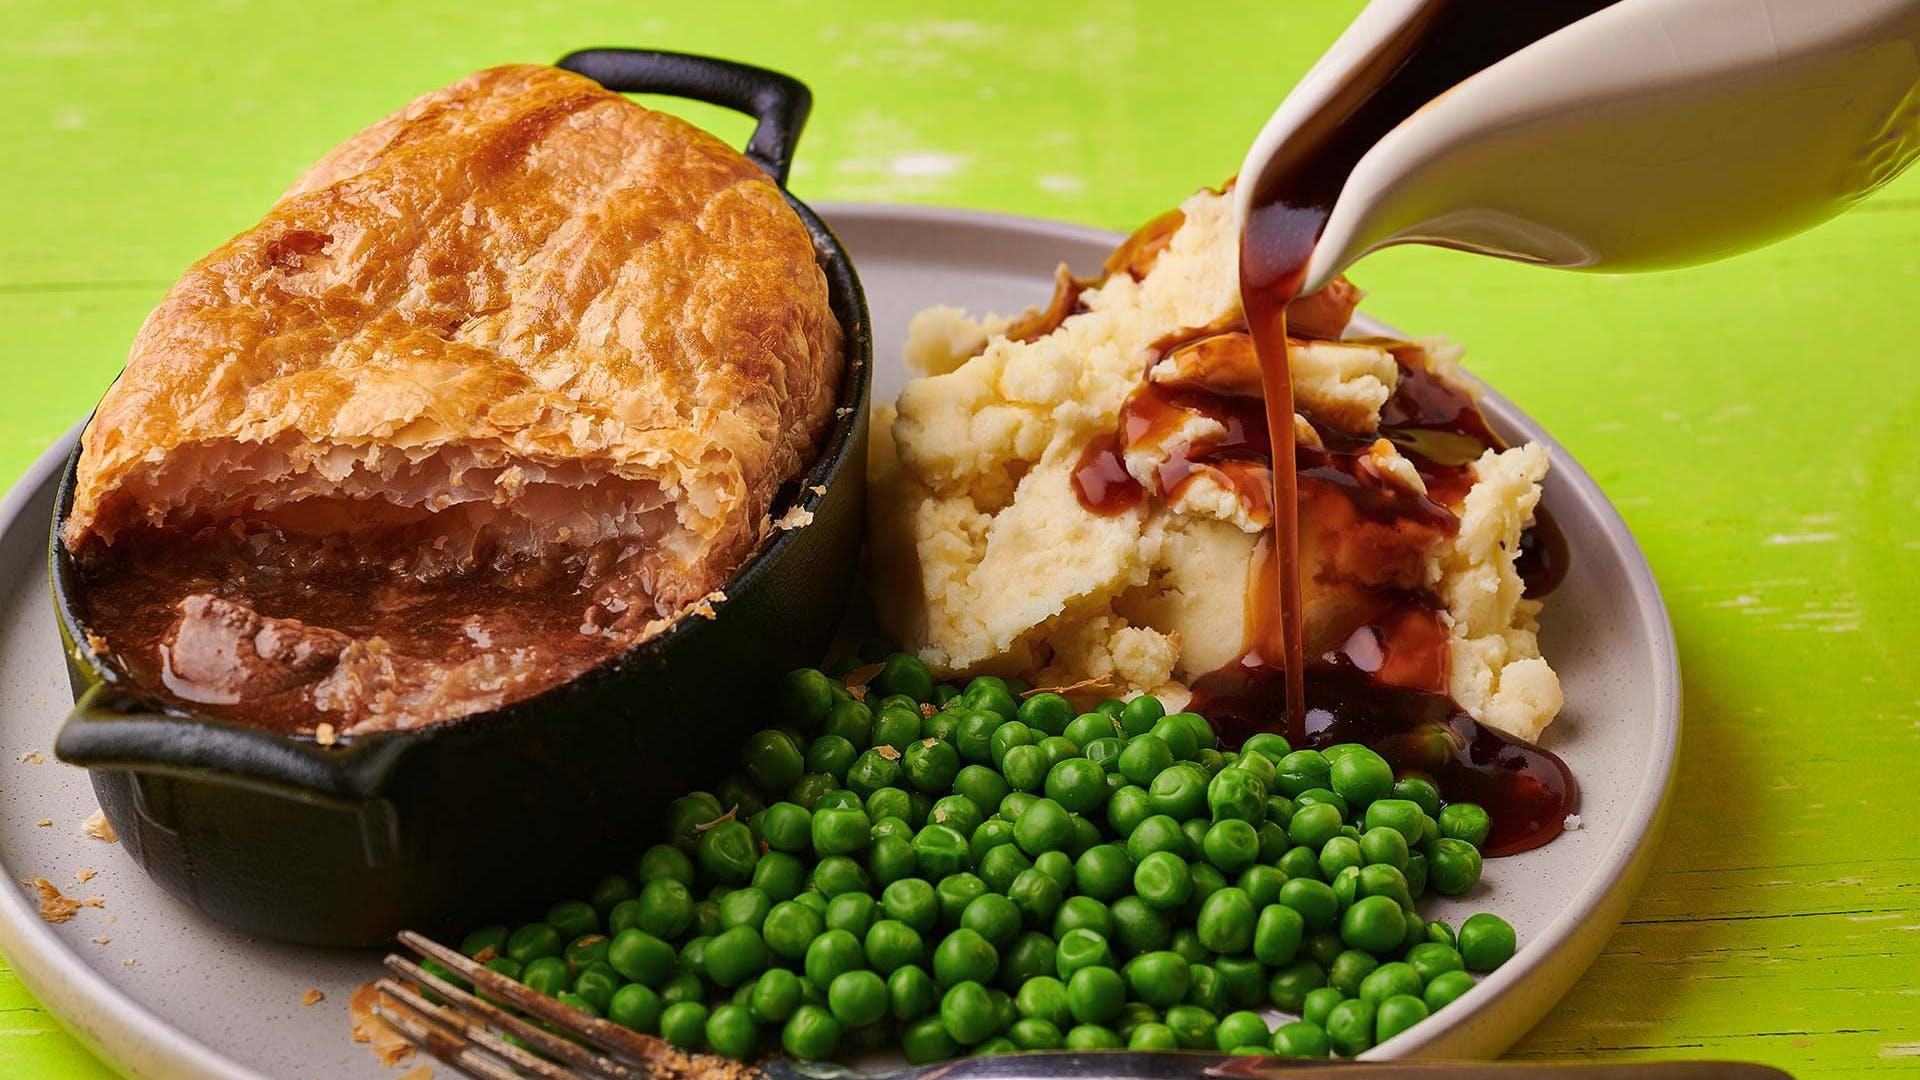 Bisto - Recipe: Gorgeous Steak and Guinness Pie